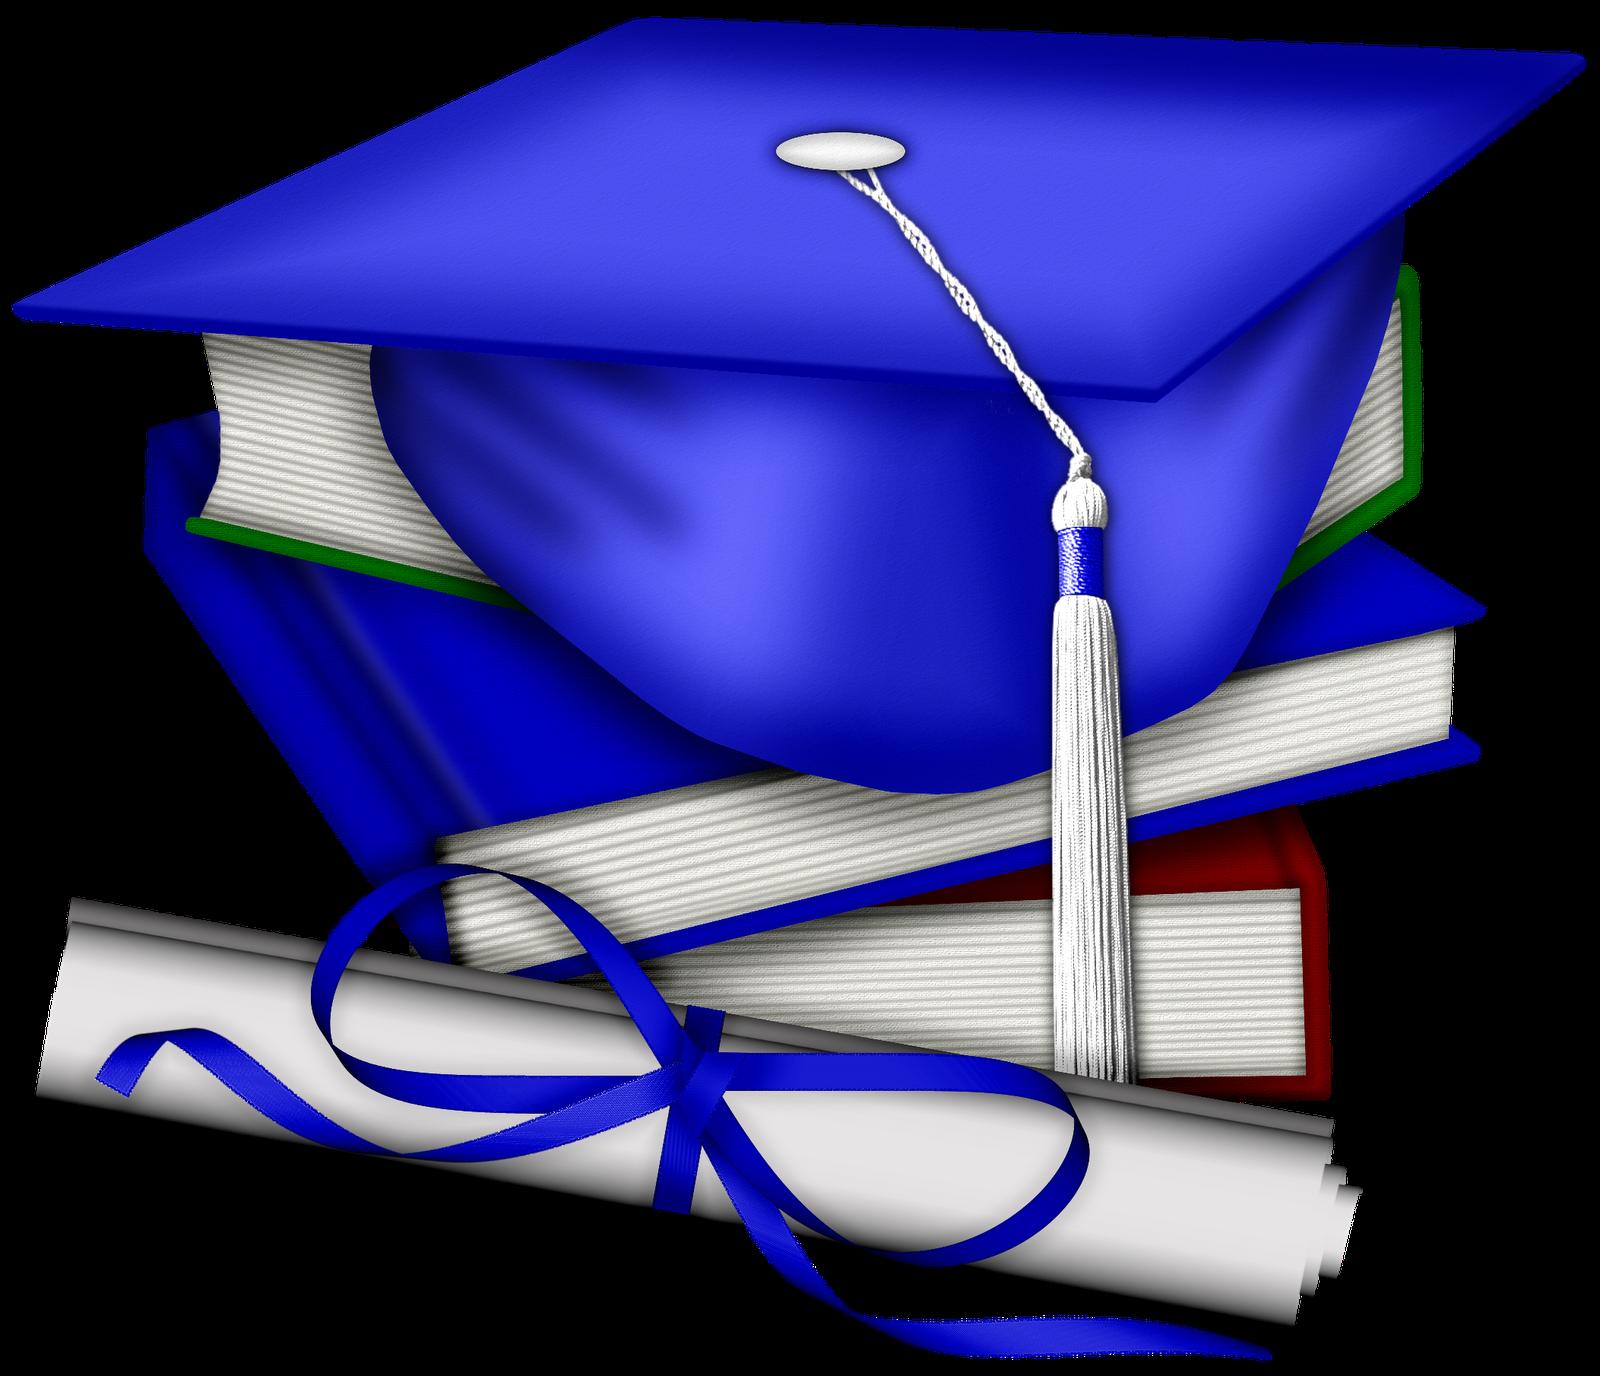 Graduation clipart graduation ceremony. Square academic cap clip